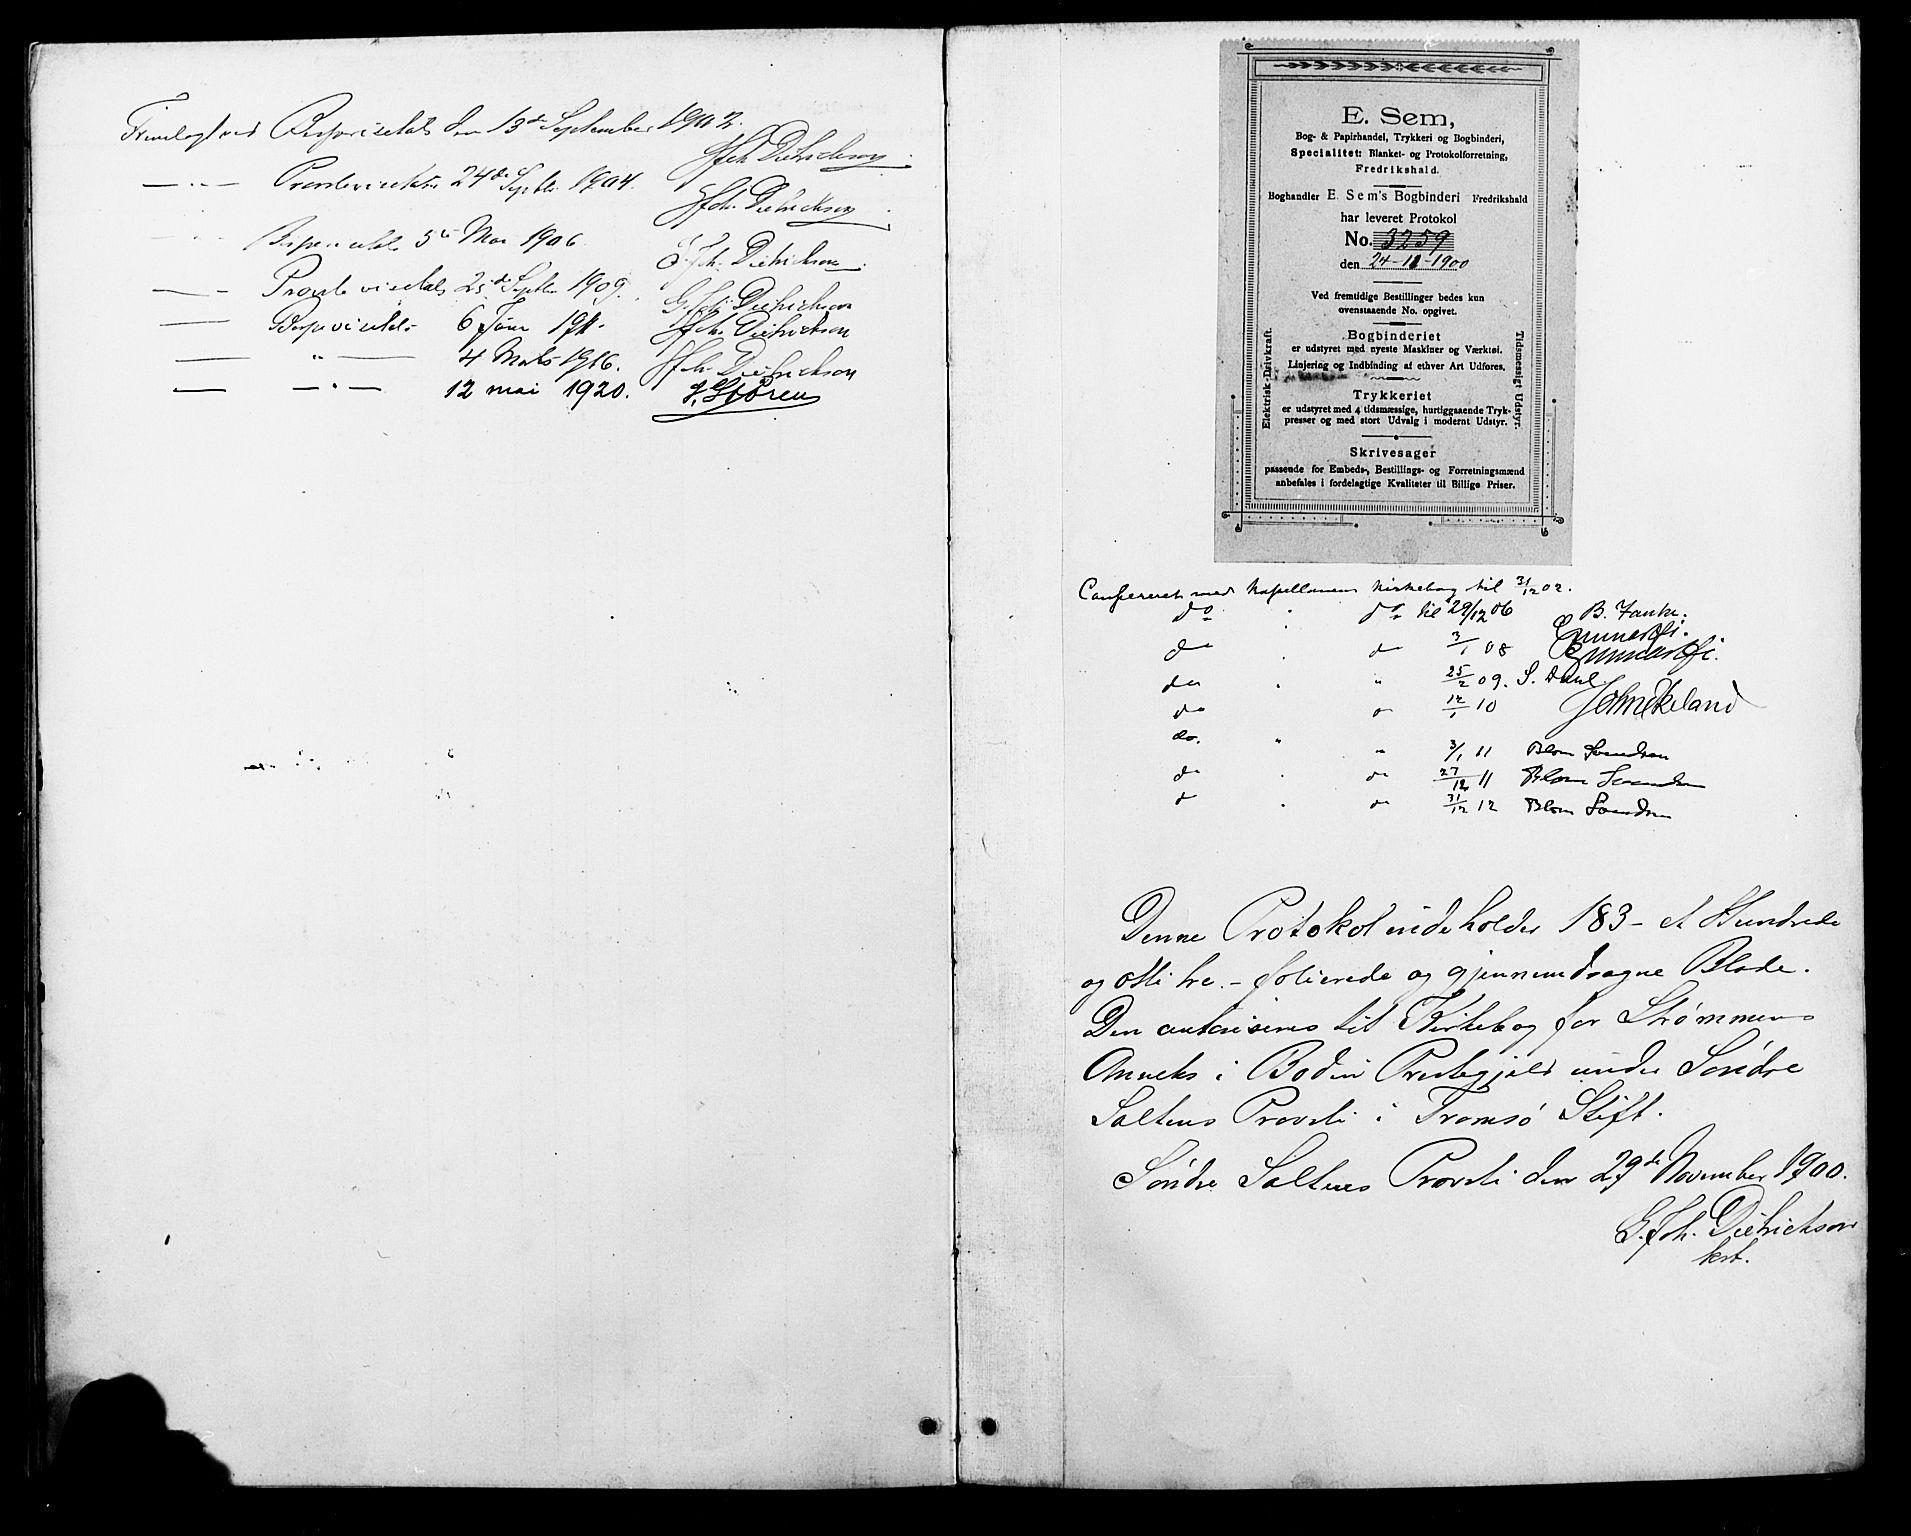 SAT, Ministerialprotokoller, klokkerbøker og fødselsregistre - Nordland, 804/L0088: Klokkerbok nr. 804C01, 1901-1917